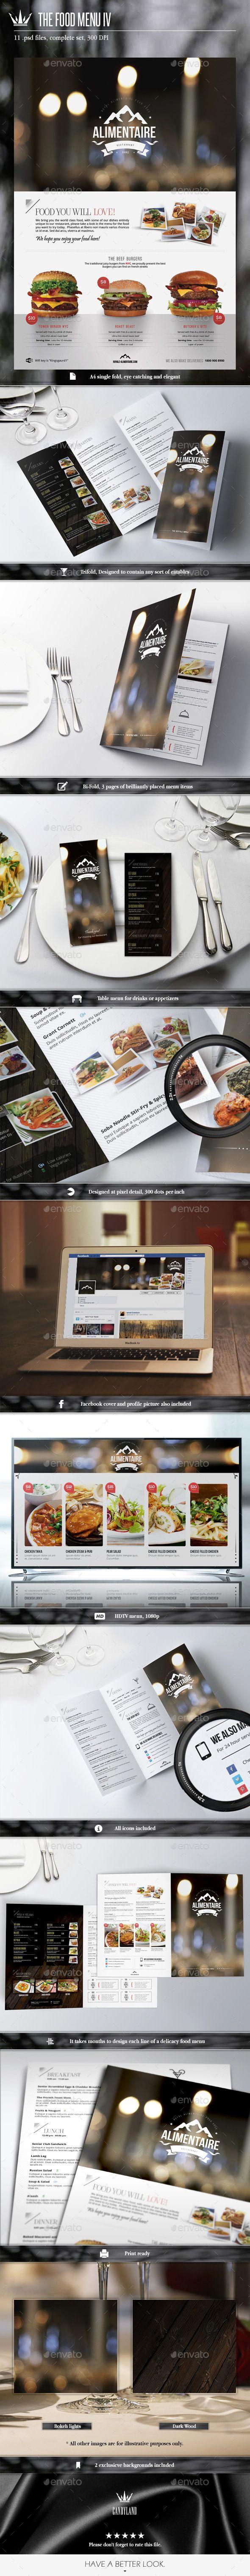 Menu Pack Template #design Download: http://graphicriver.net/item/menu-pack-4/10254730?ref=ksioks